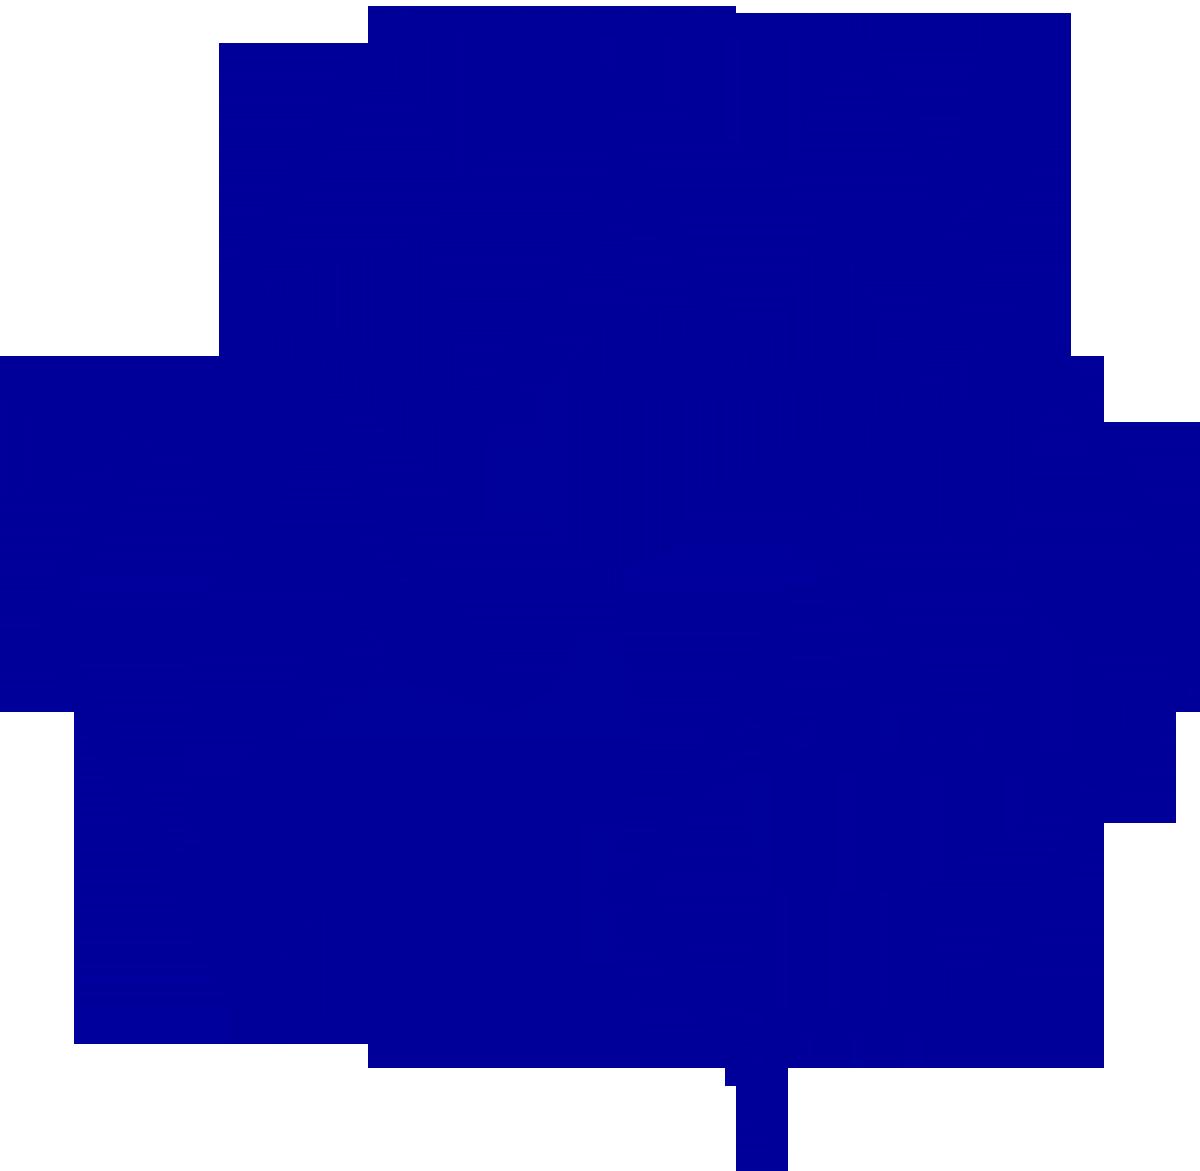 Dark blue universal symbol. Magazine clipart recycling